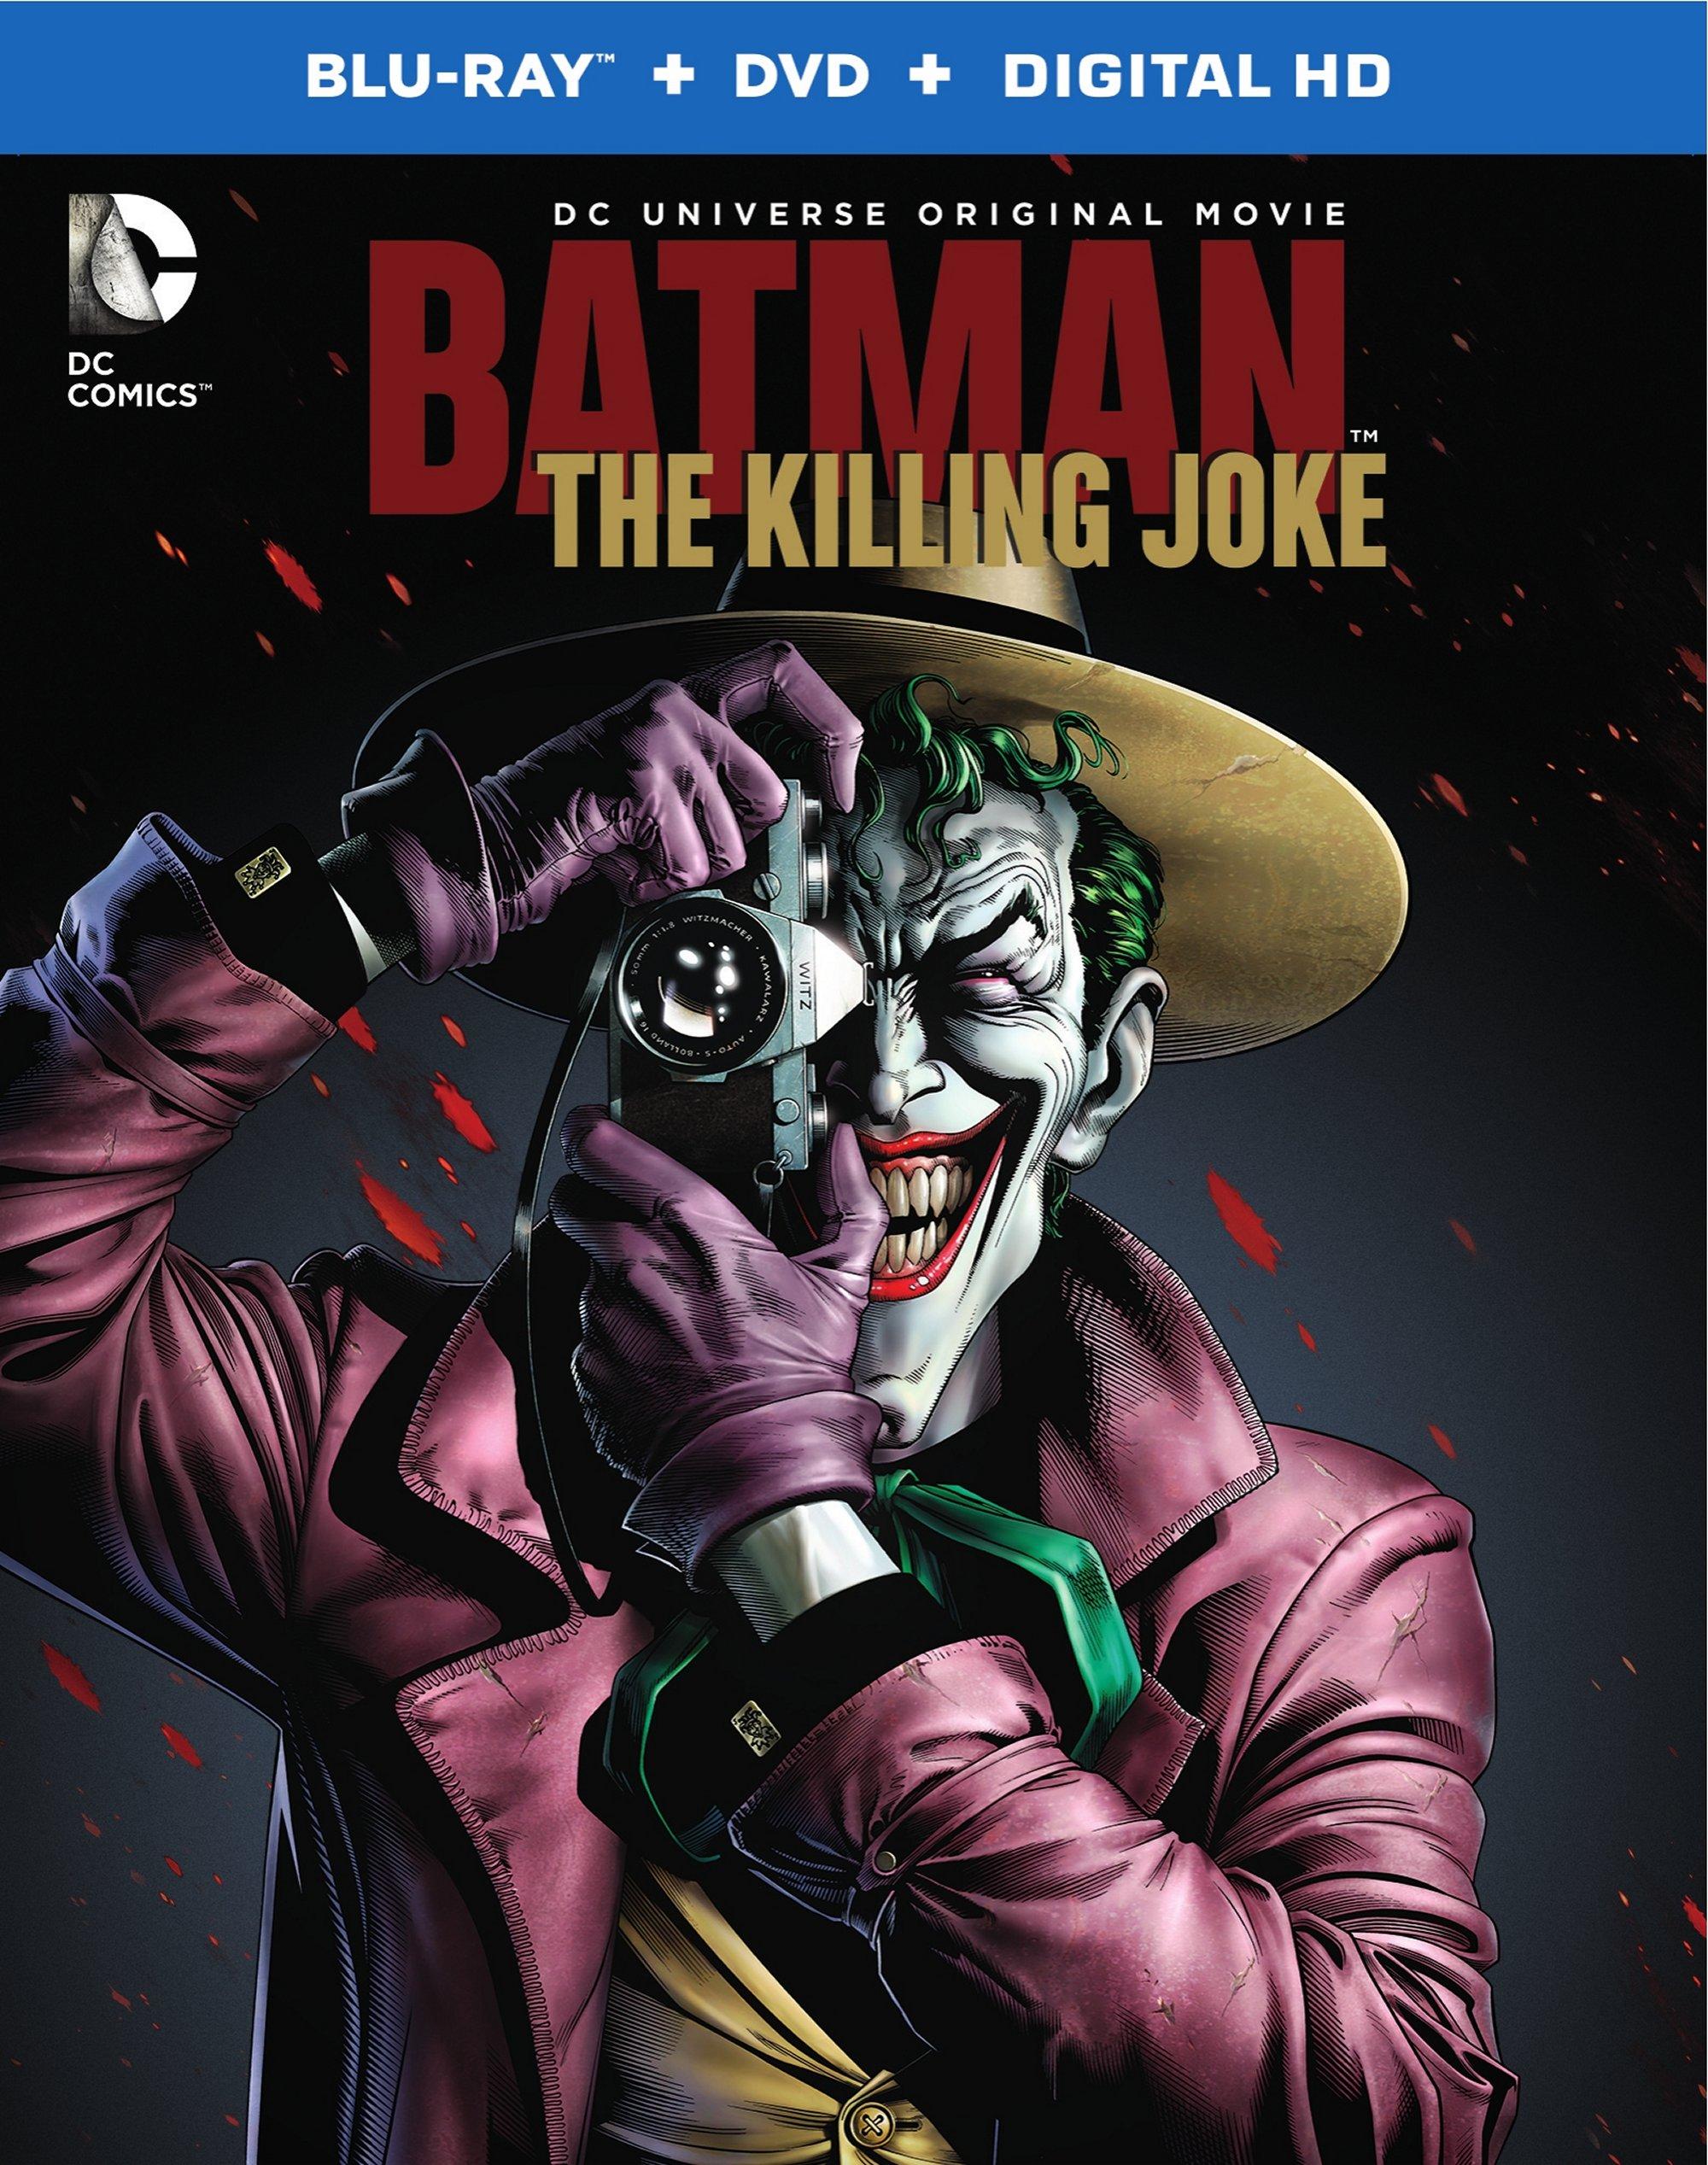 The Killing Joke Blu-ray box art